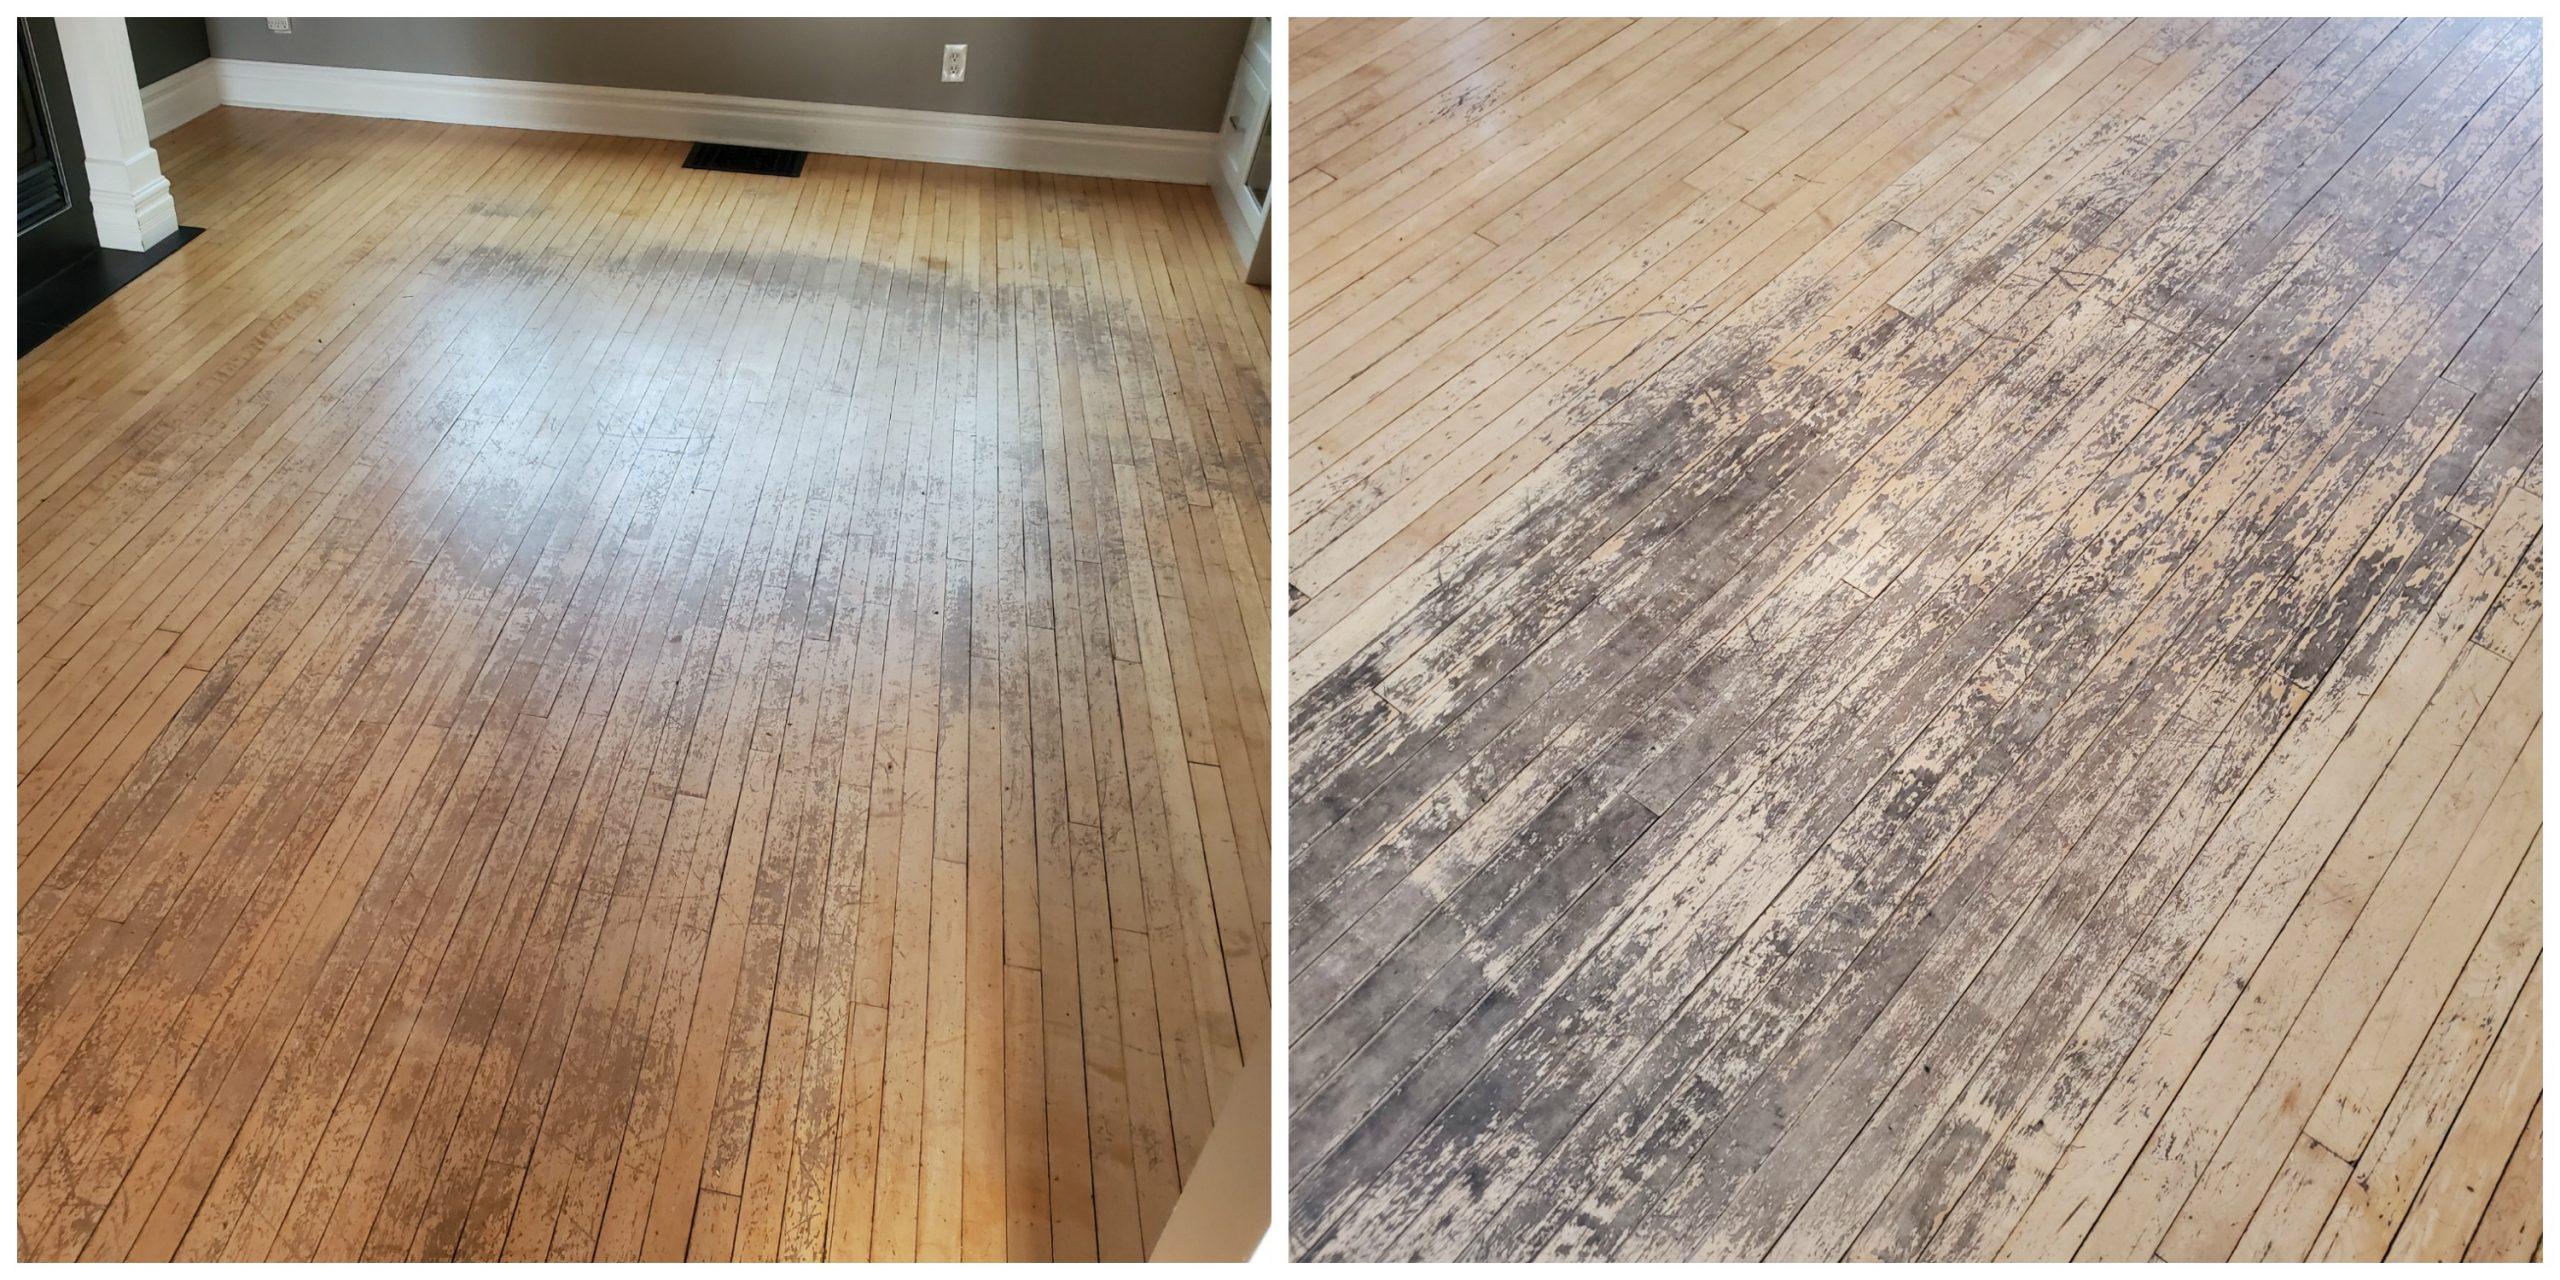 refinishing hardwood floors-2